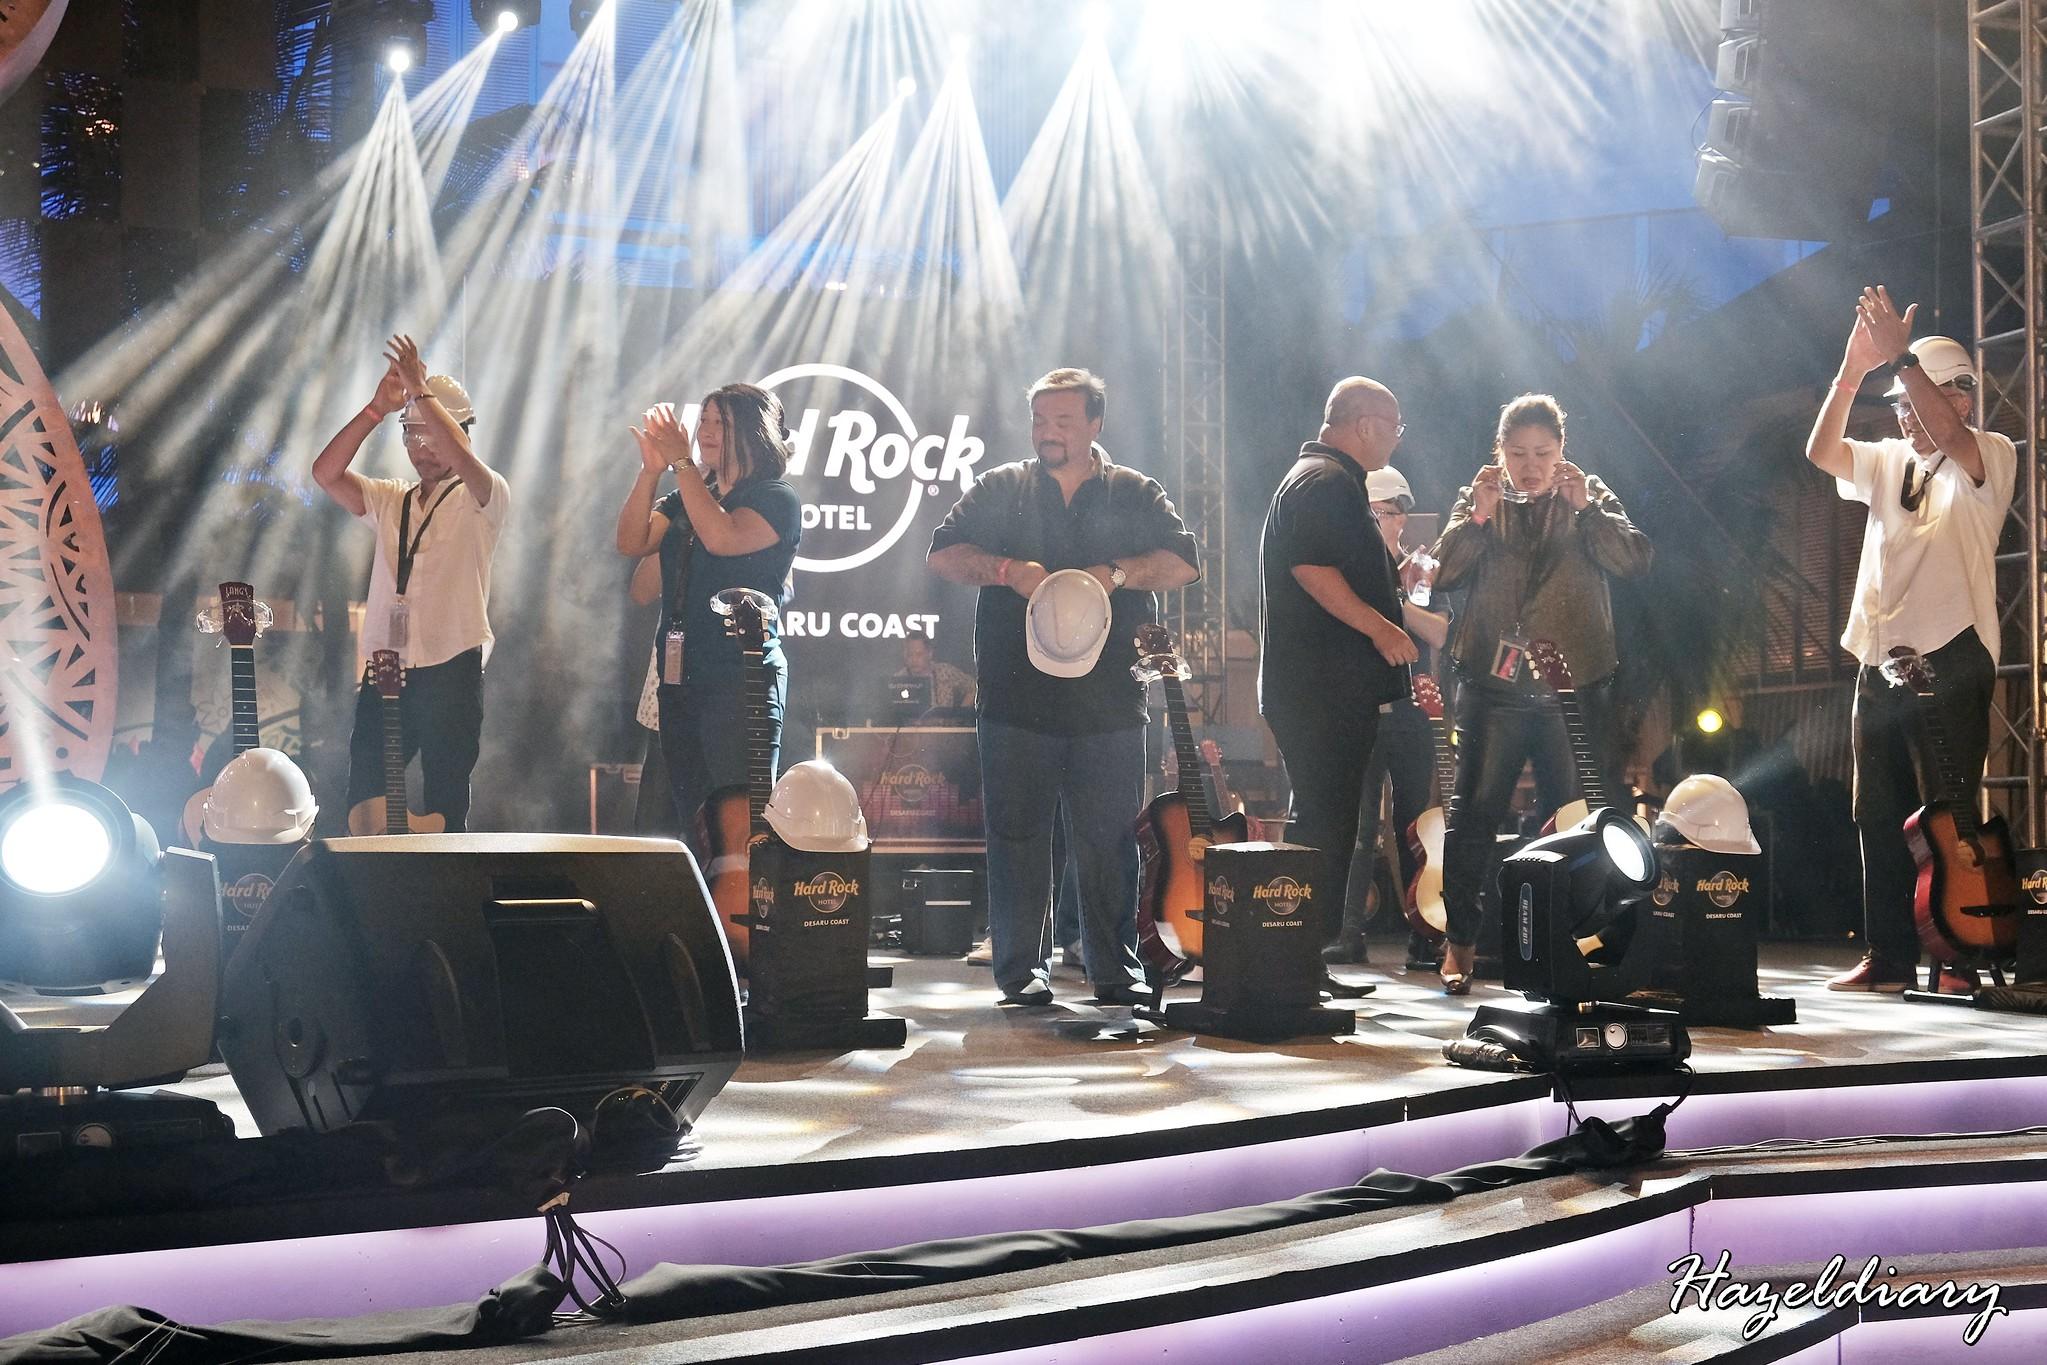 Hard Rock Hotel Desaru Coast-Guitar Smashing Ceremony